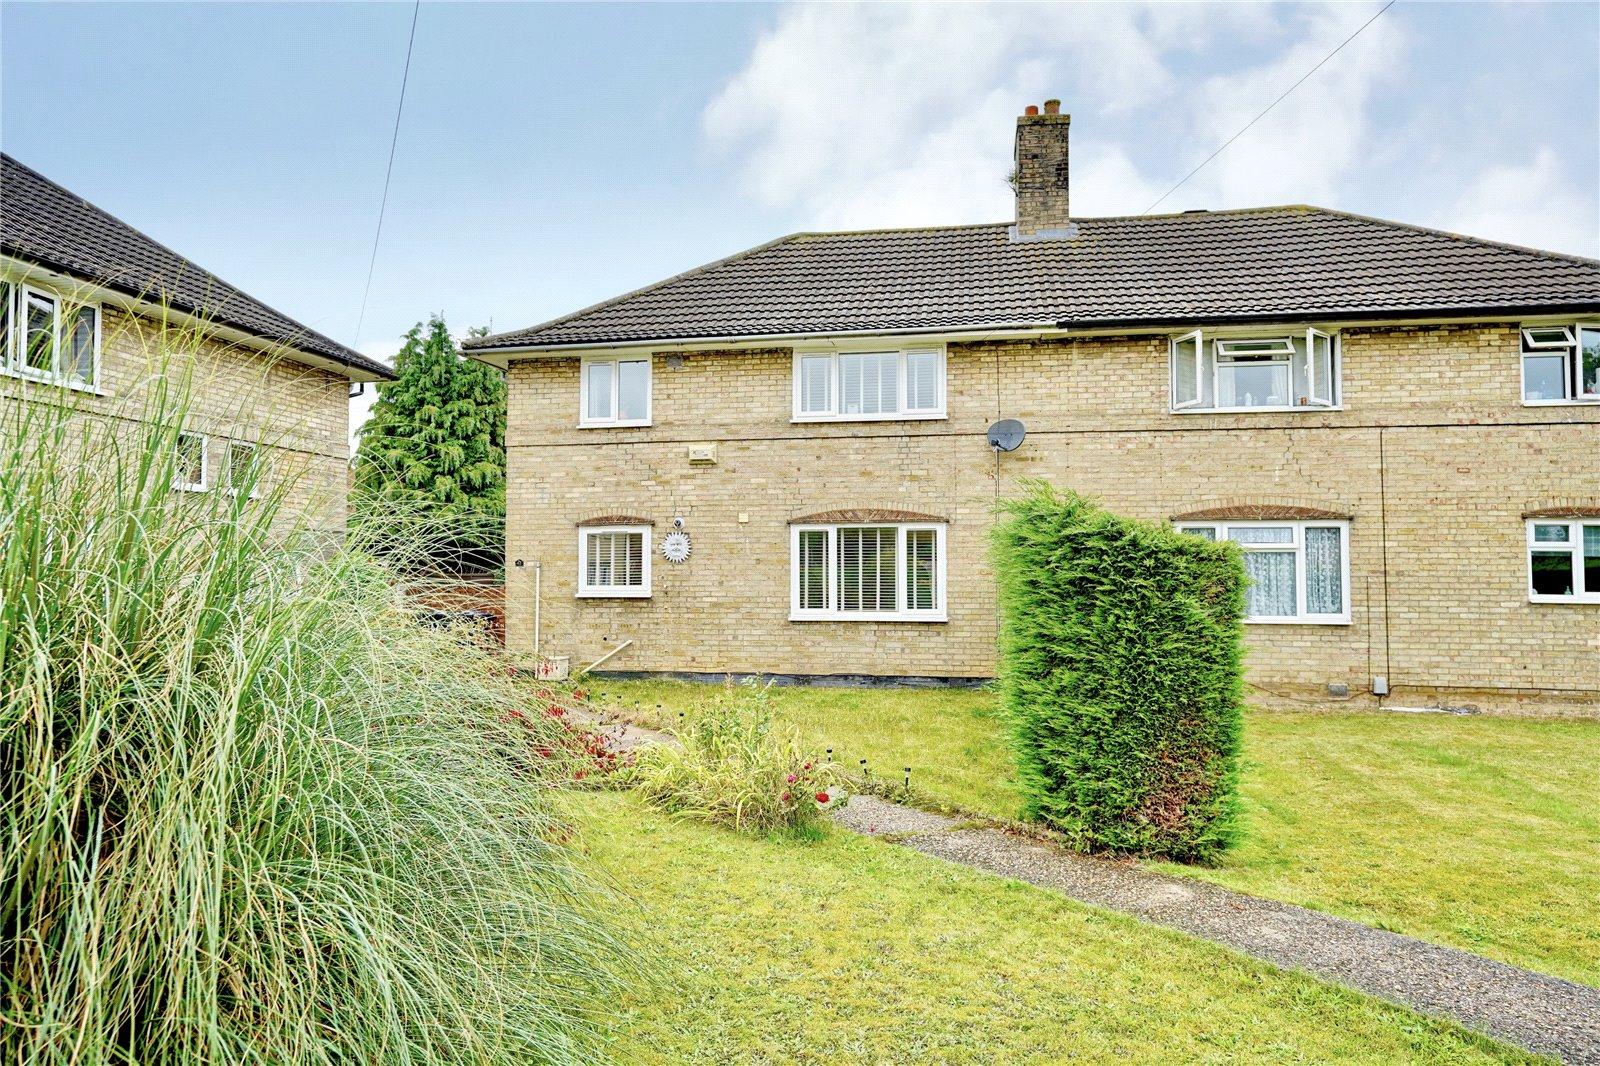 4 bed house for sale in Ferrars Avenue, Eynesbury, PE19